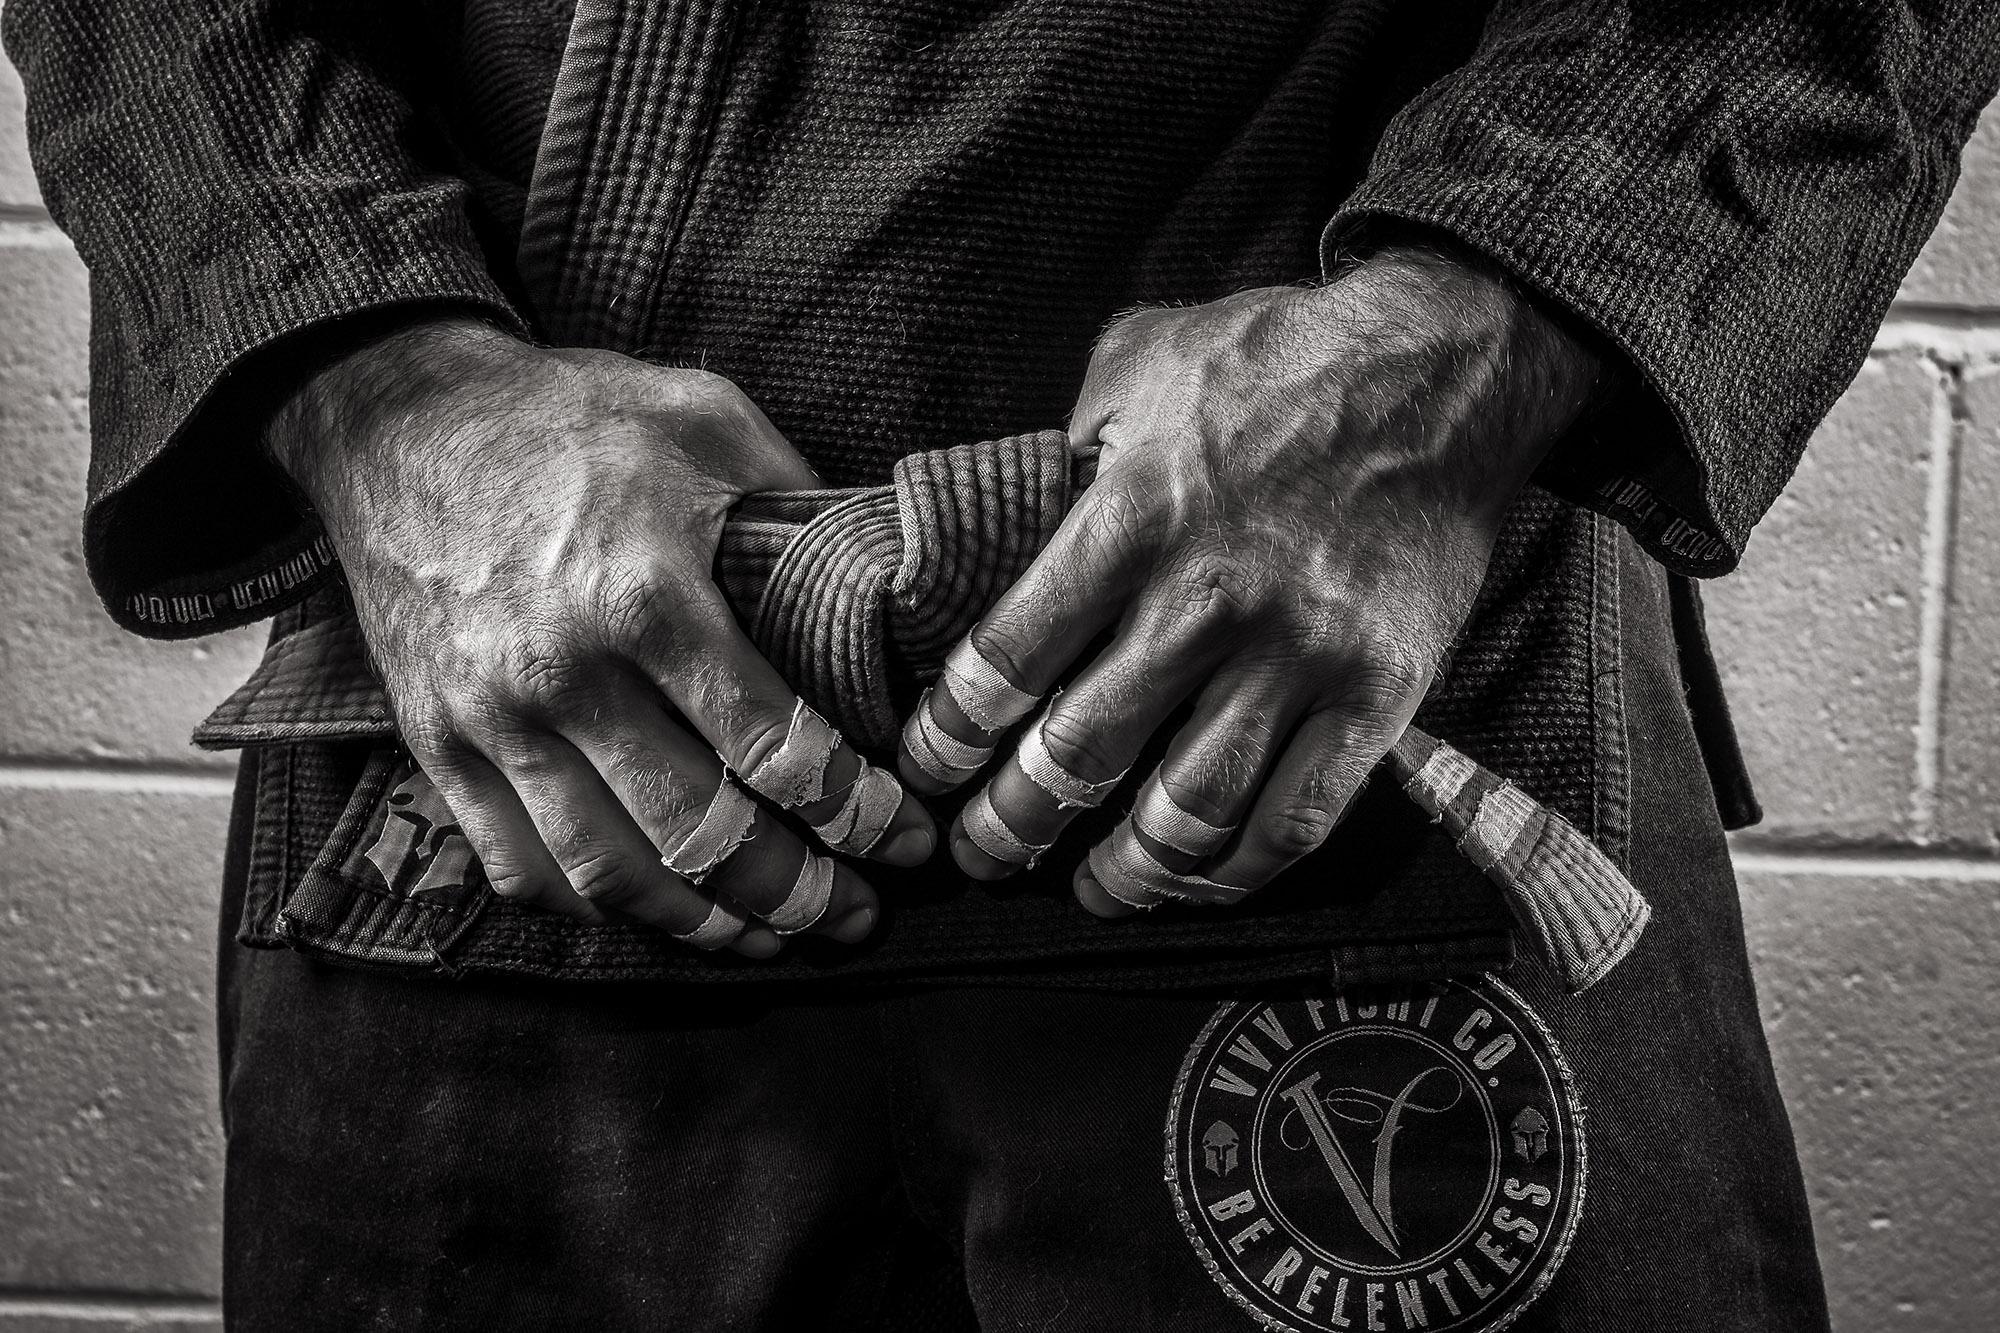 brazilian-jiu-jitsu-gi-and-belt.jpg